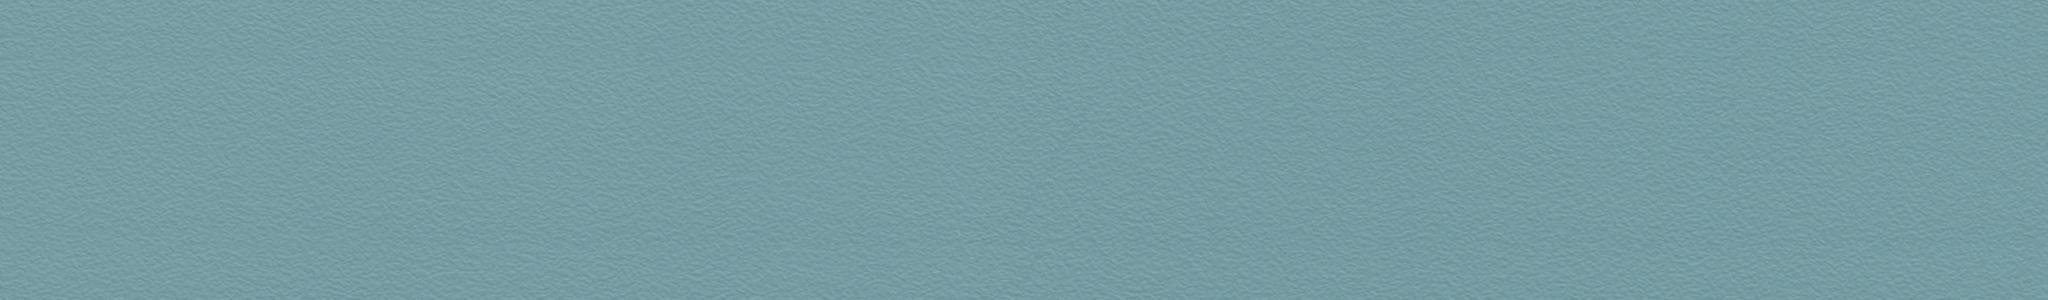 HU 158502 ABS hrana modrá Bristol perla XG